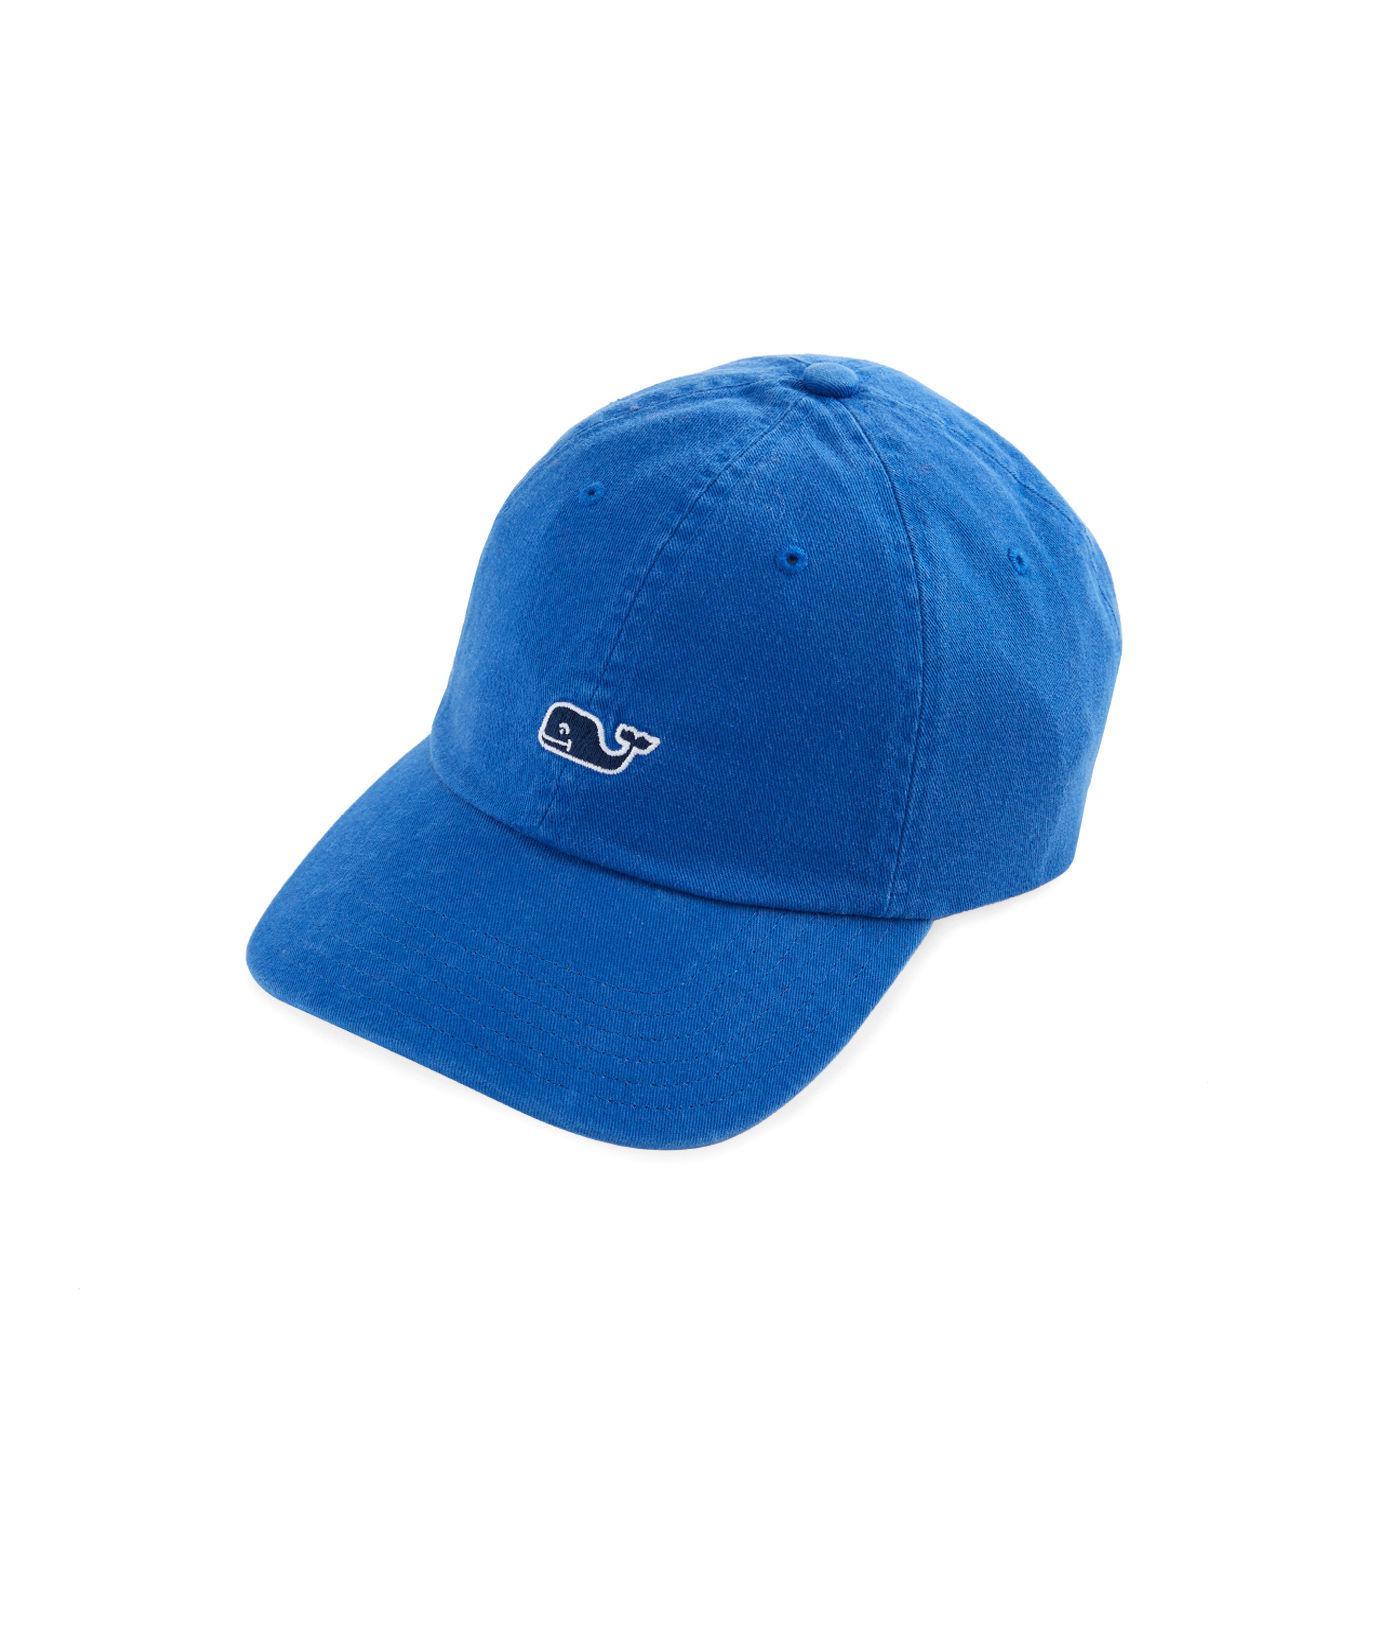 c5a60da47b5 Lyst - Vineyard Vines Classic Twill Baseball Hat in Blue